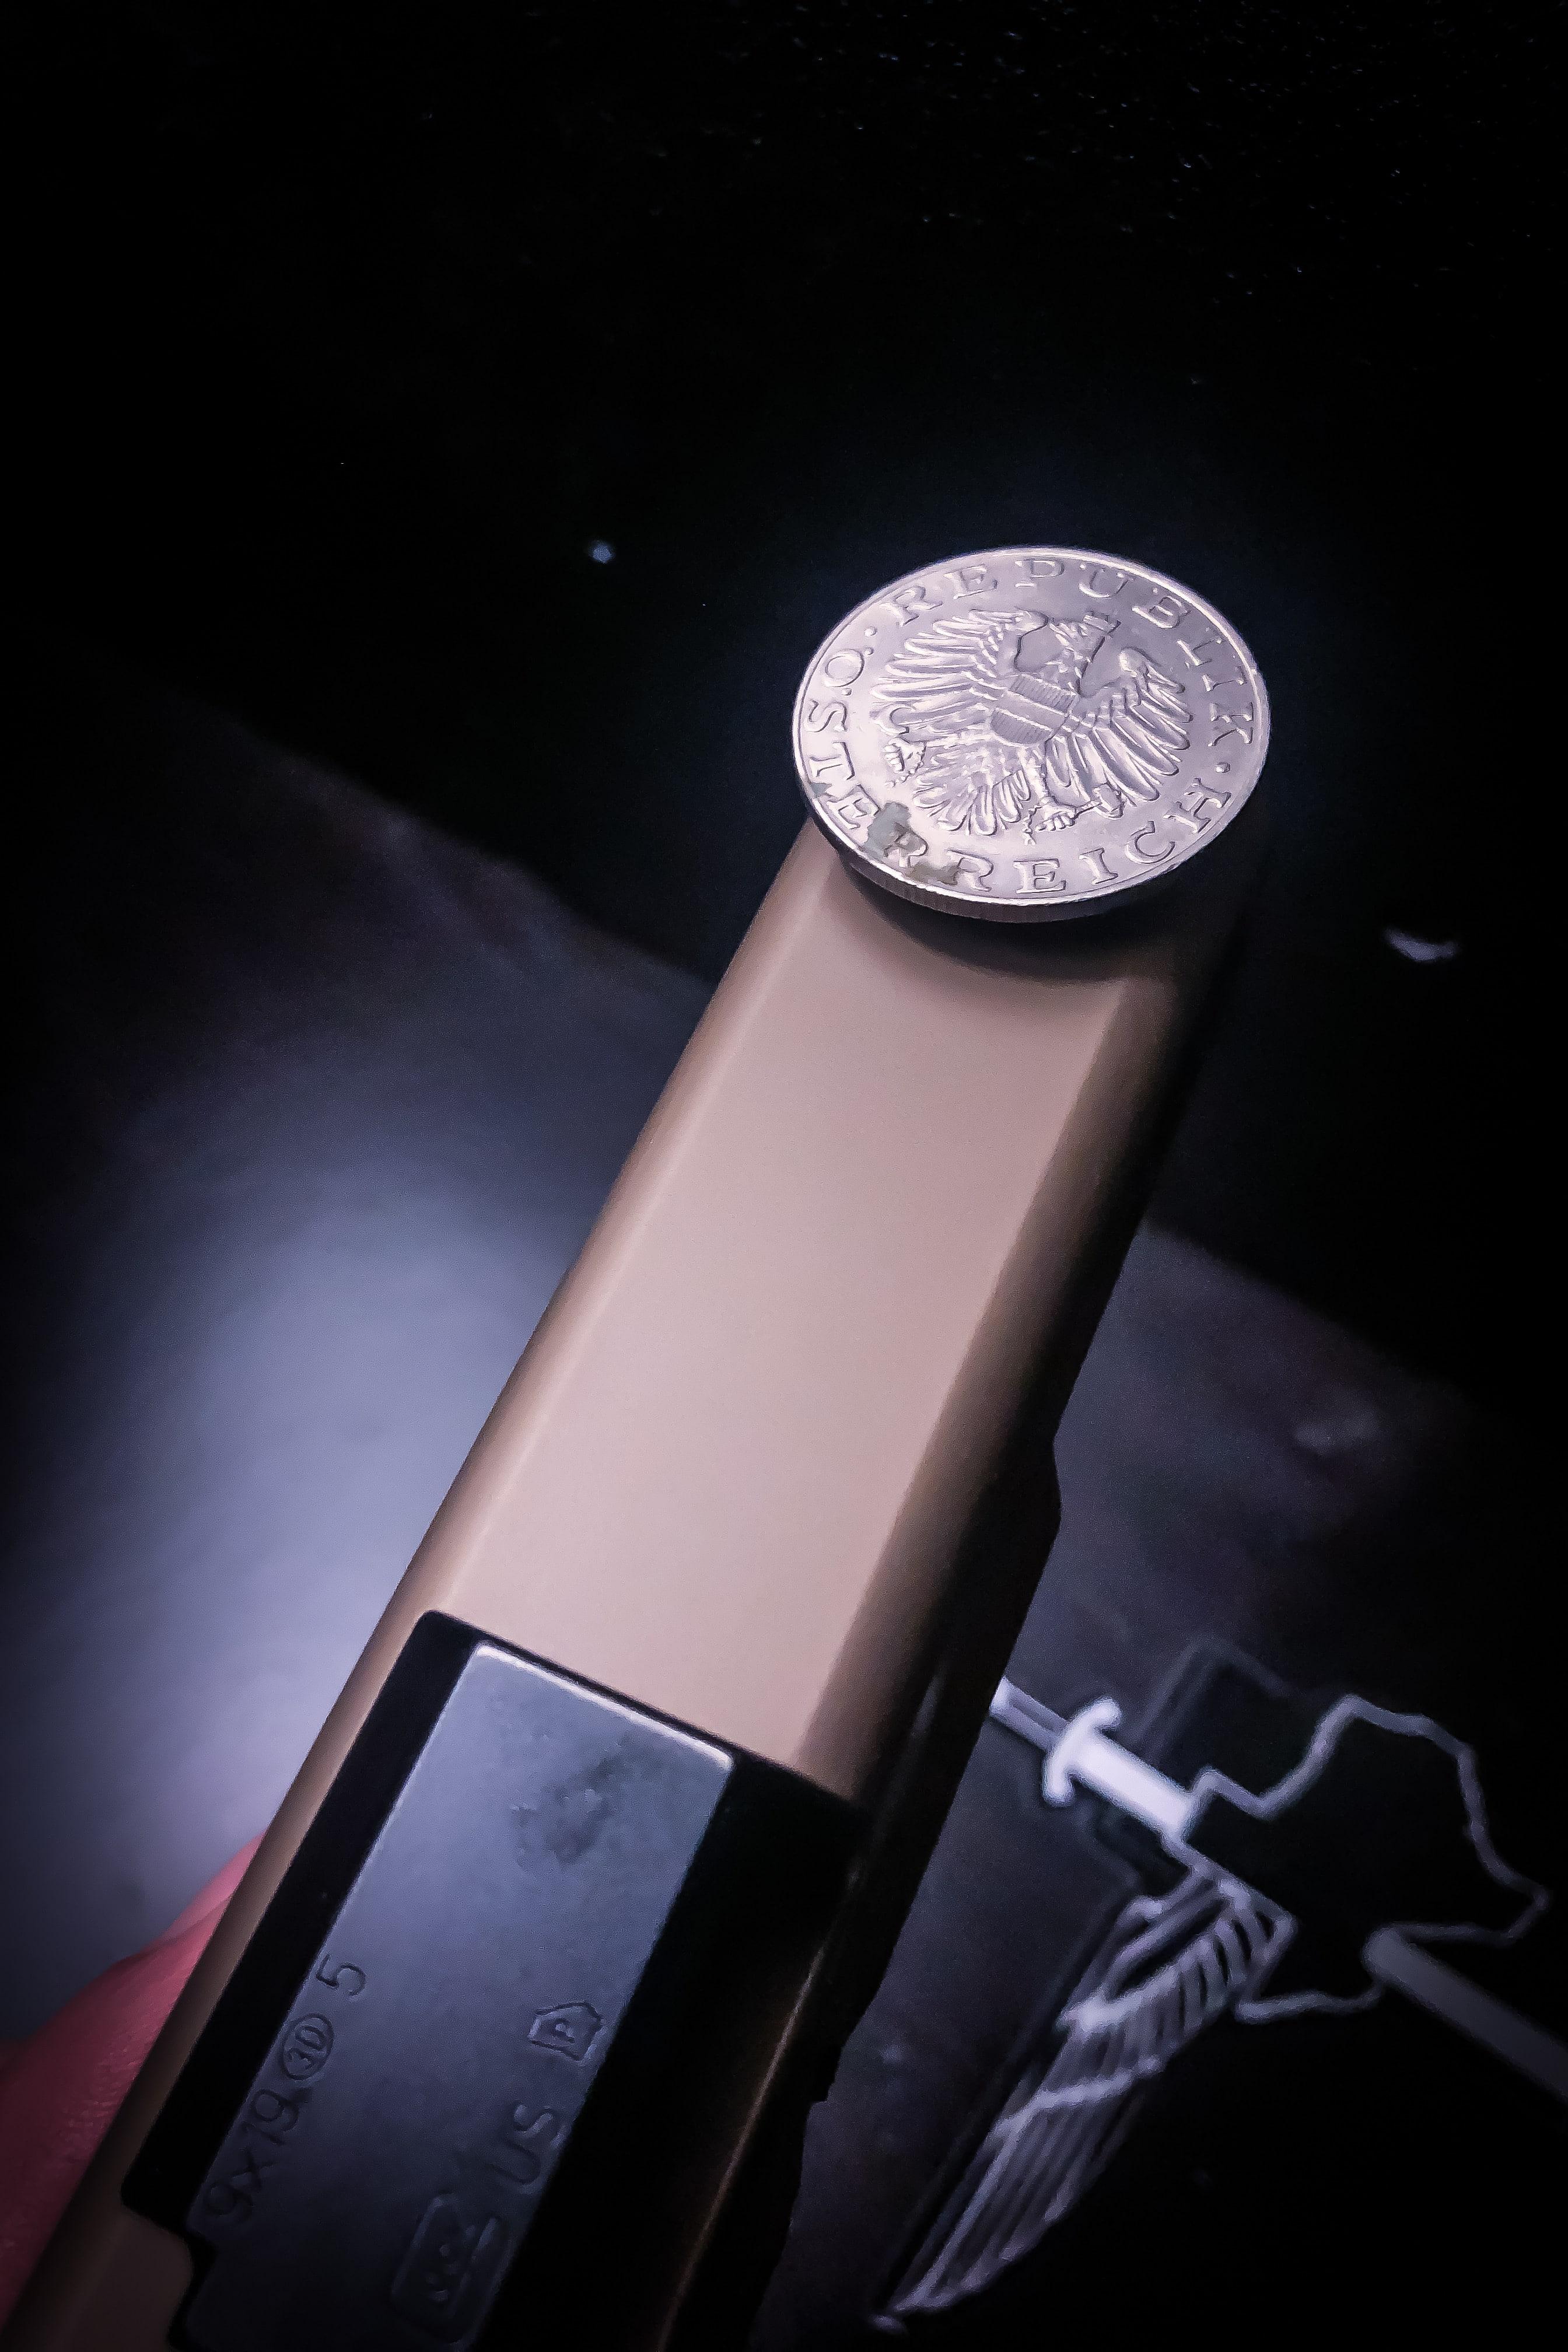 A GLOCK 19x with an Austrian 10 Schilling coin balanced.